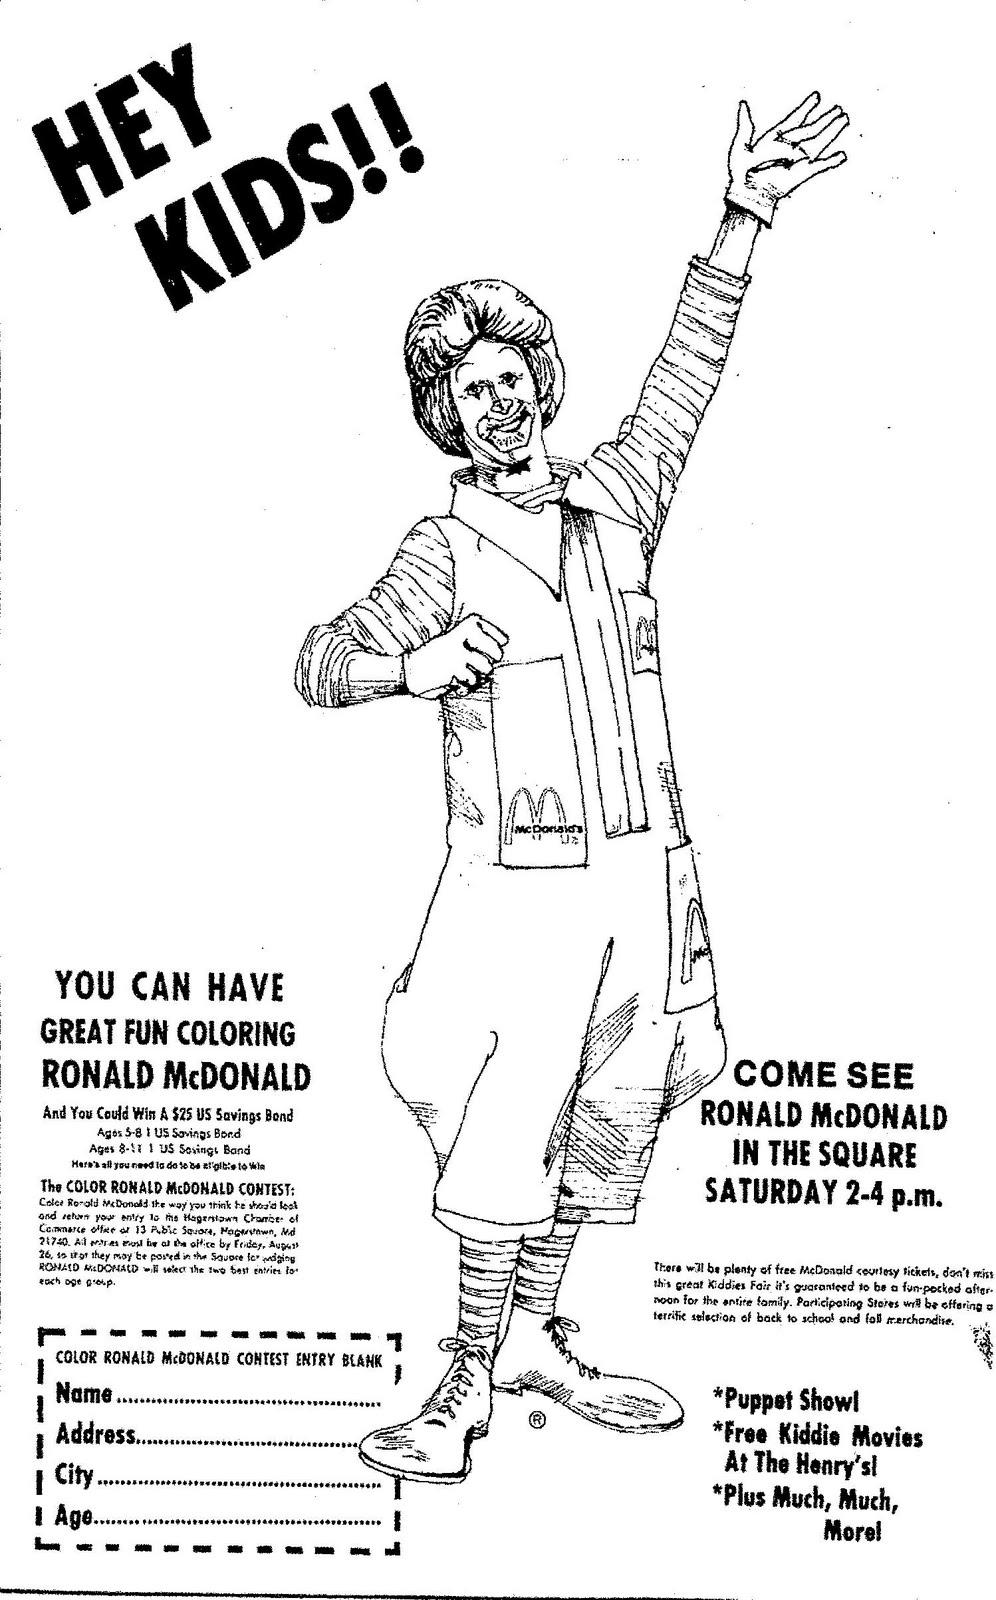 Mostly Paper Dolls: Color Ronald McDonald Contest, 1977